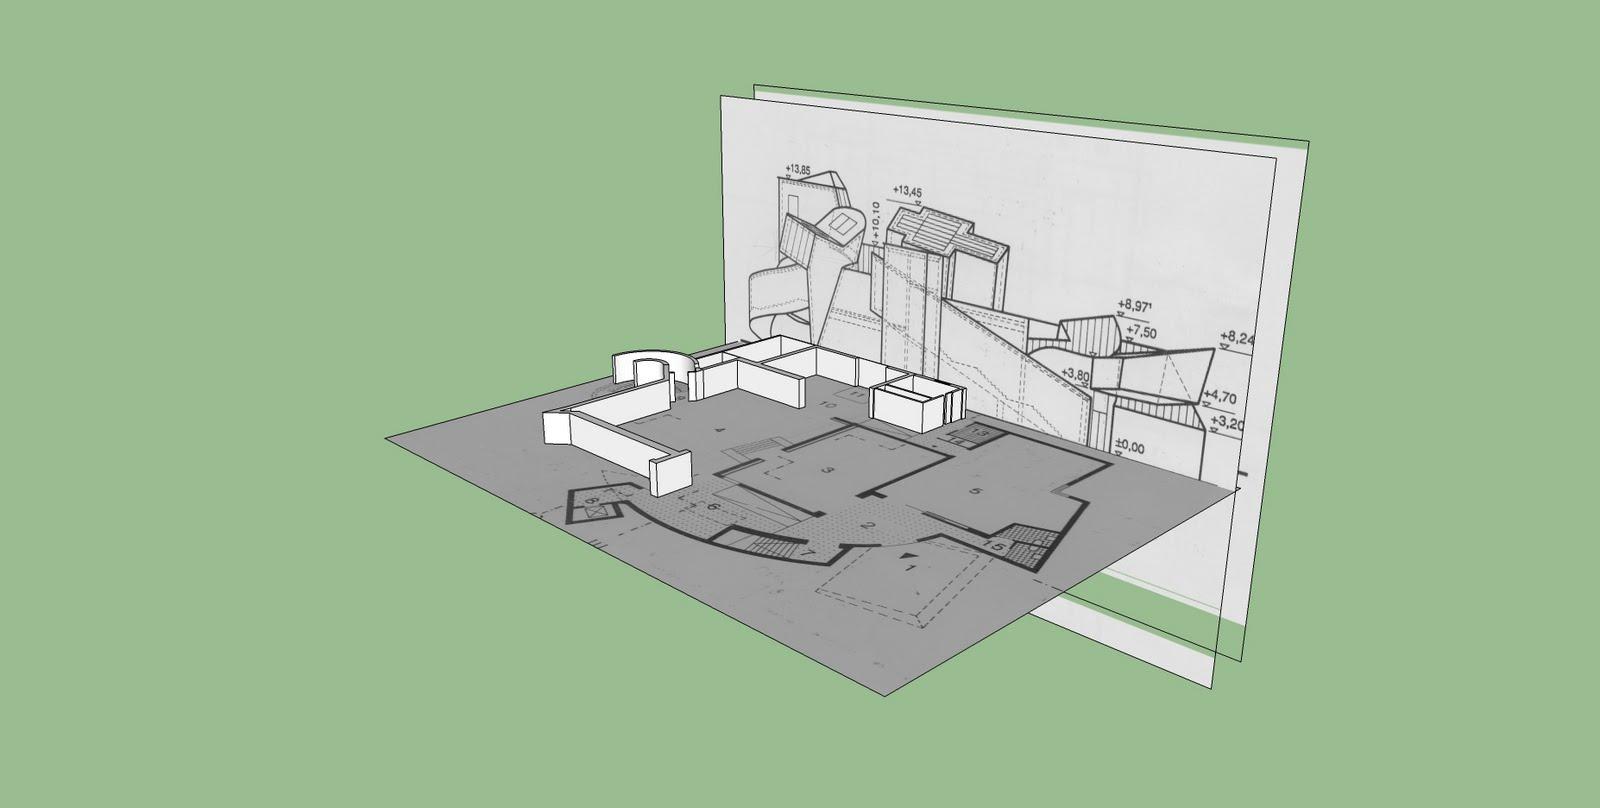 kristin harris arch1390 vitra design museum progress. Black Bedroom Furniture Sets. Home Design Ideas